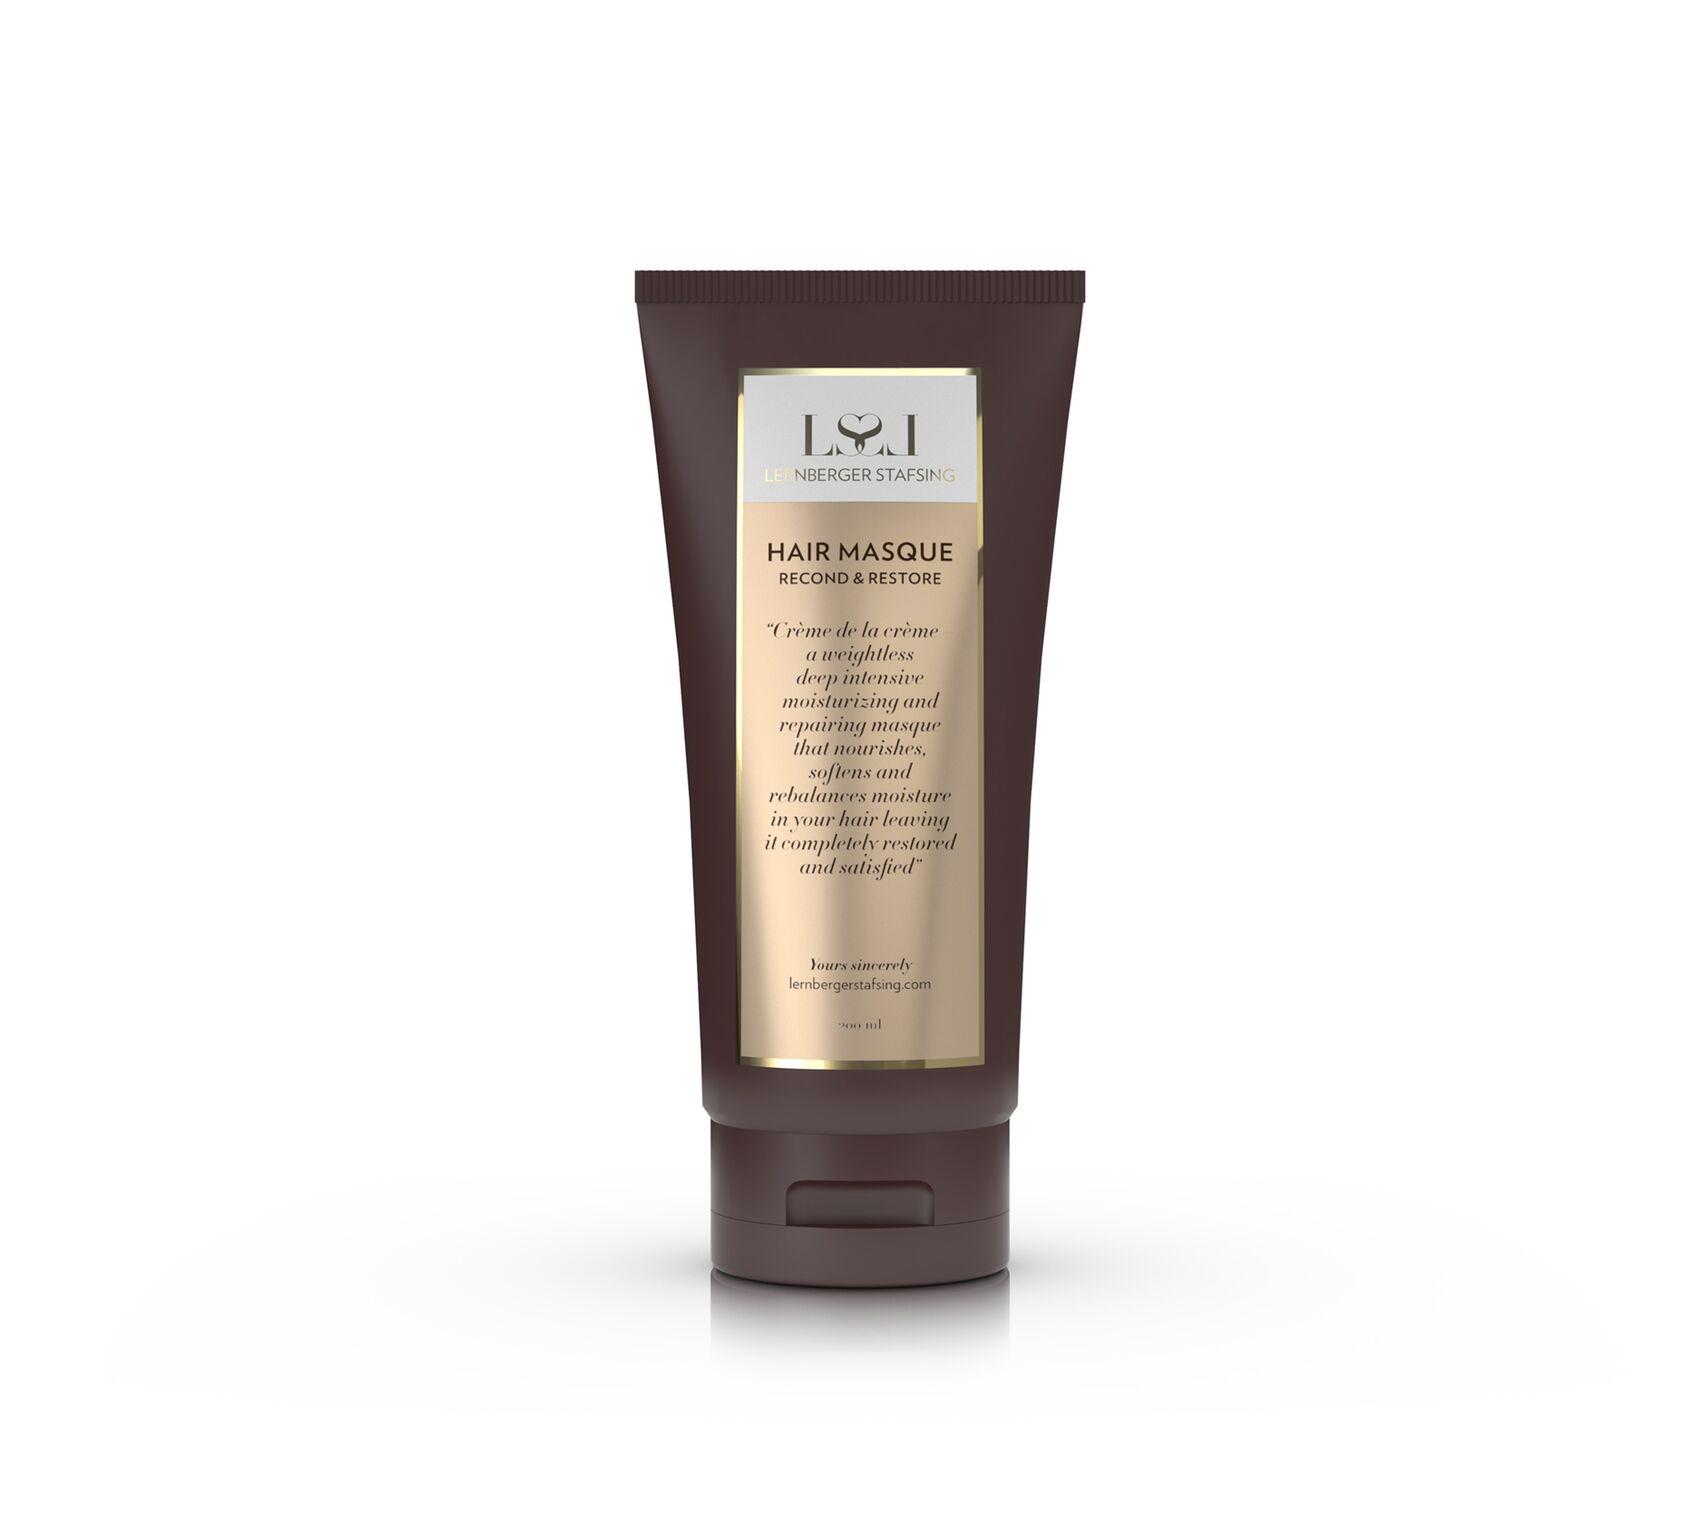 Lernberger Stafsing Hair Masque, 200 ml